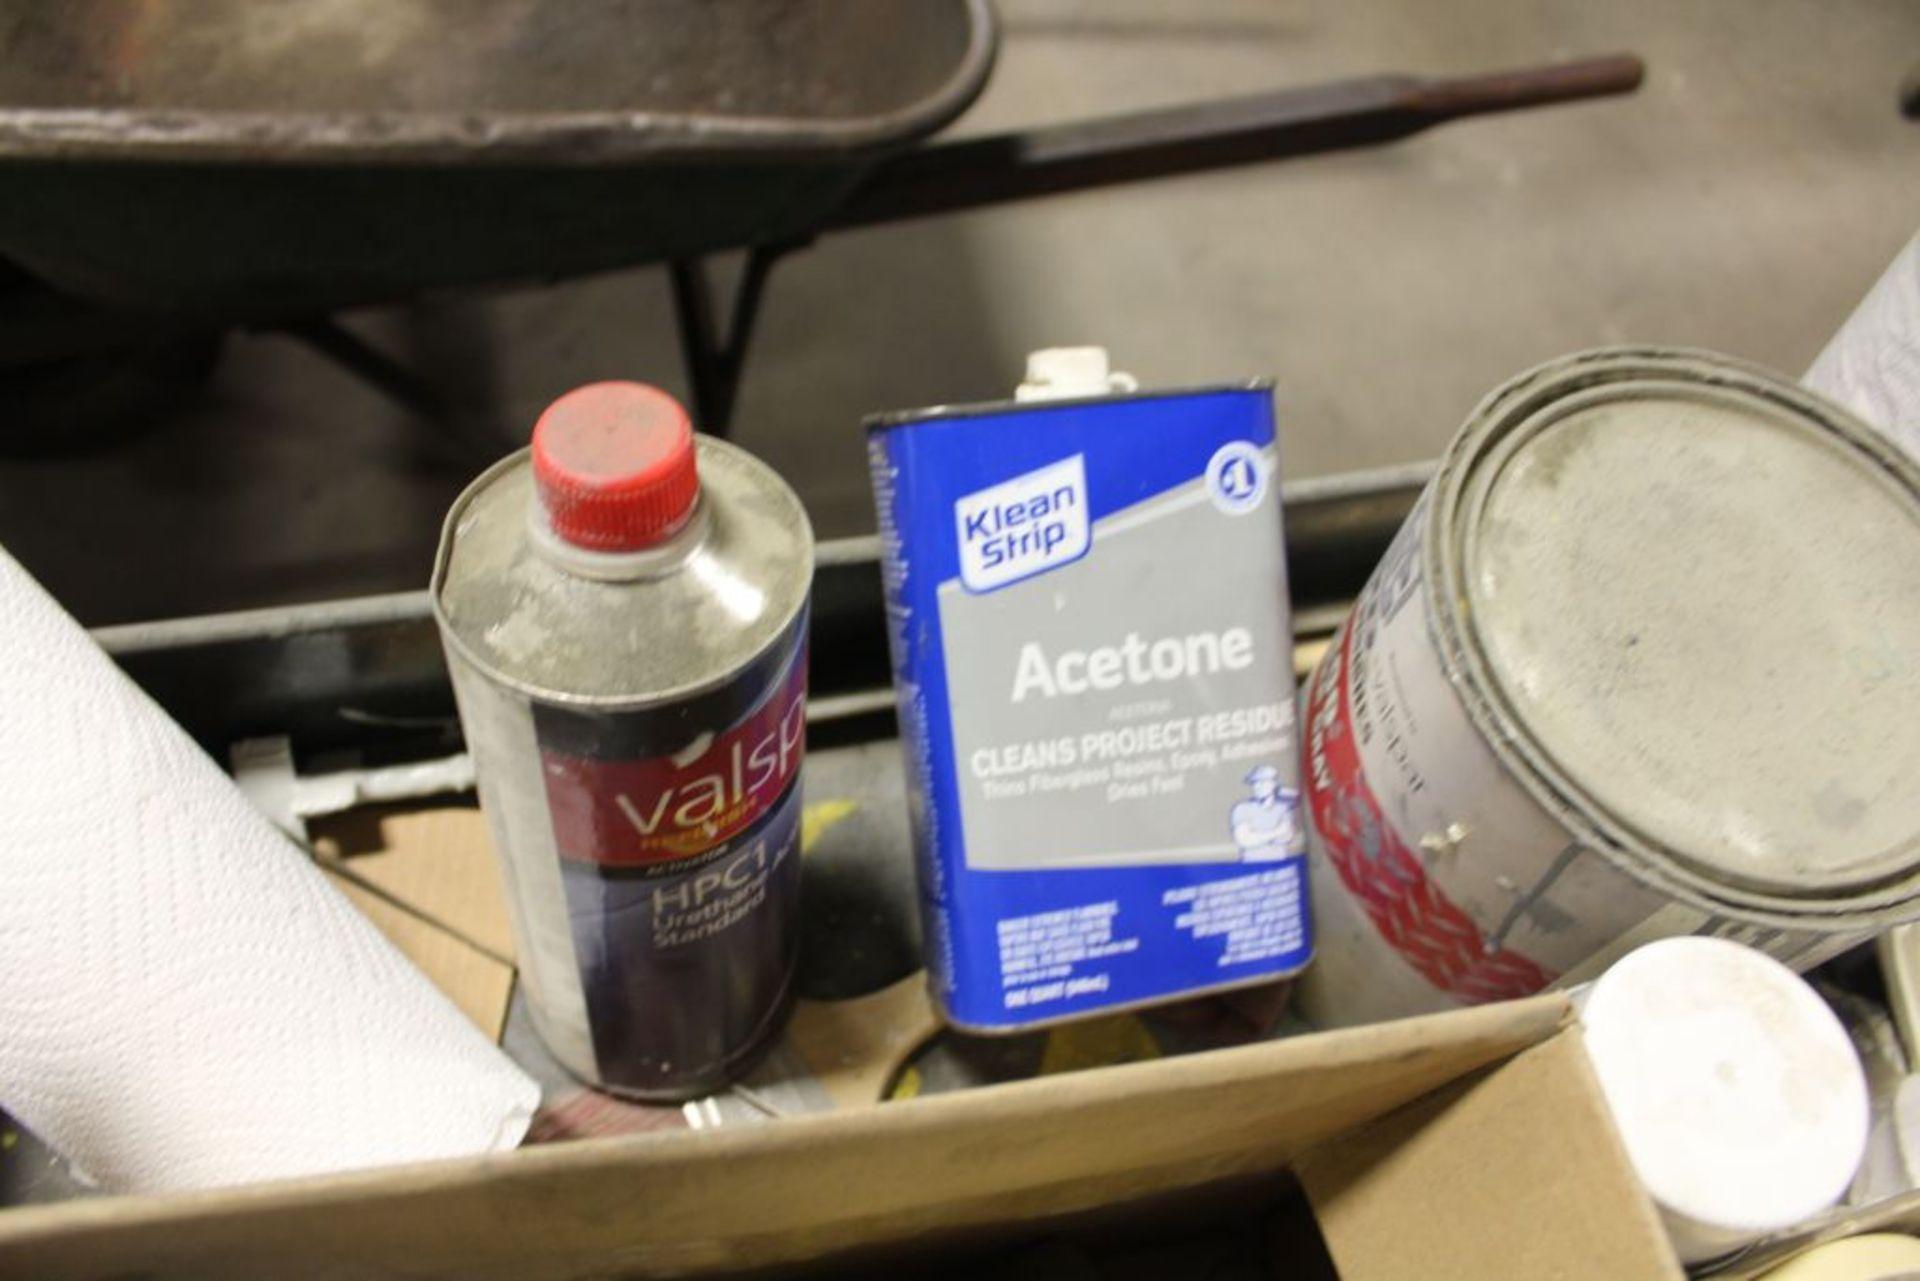 Lot 434 - Job cart with contents, auto body paint, spray gun, etc.